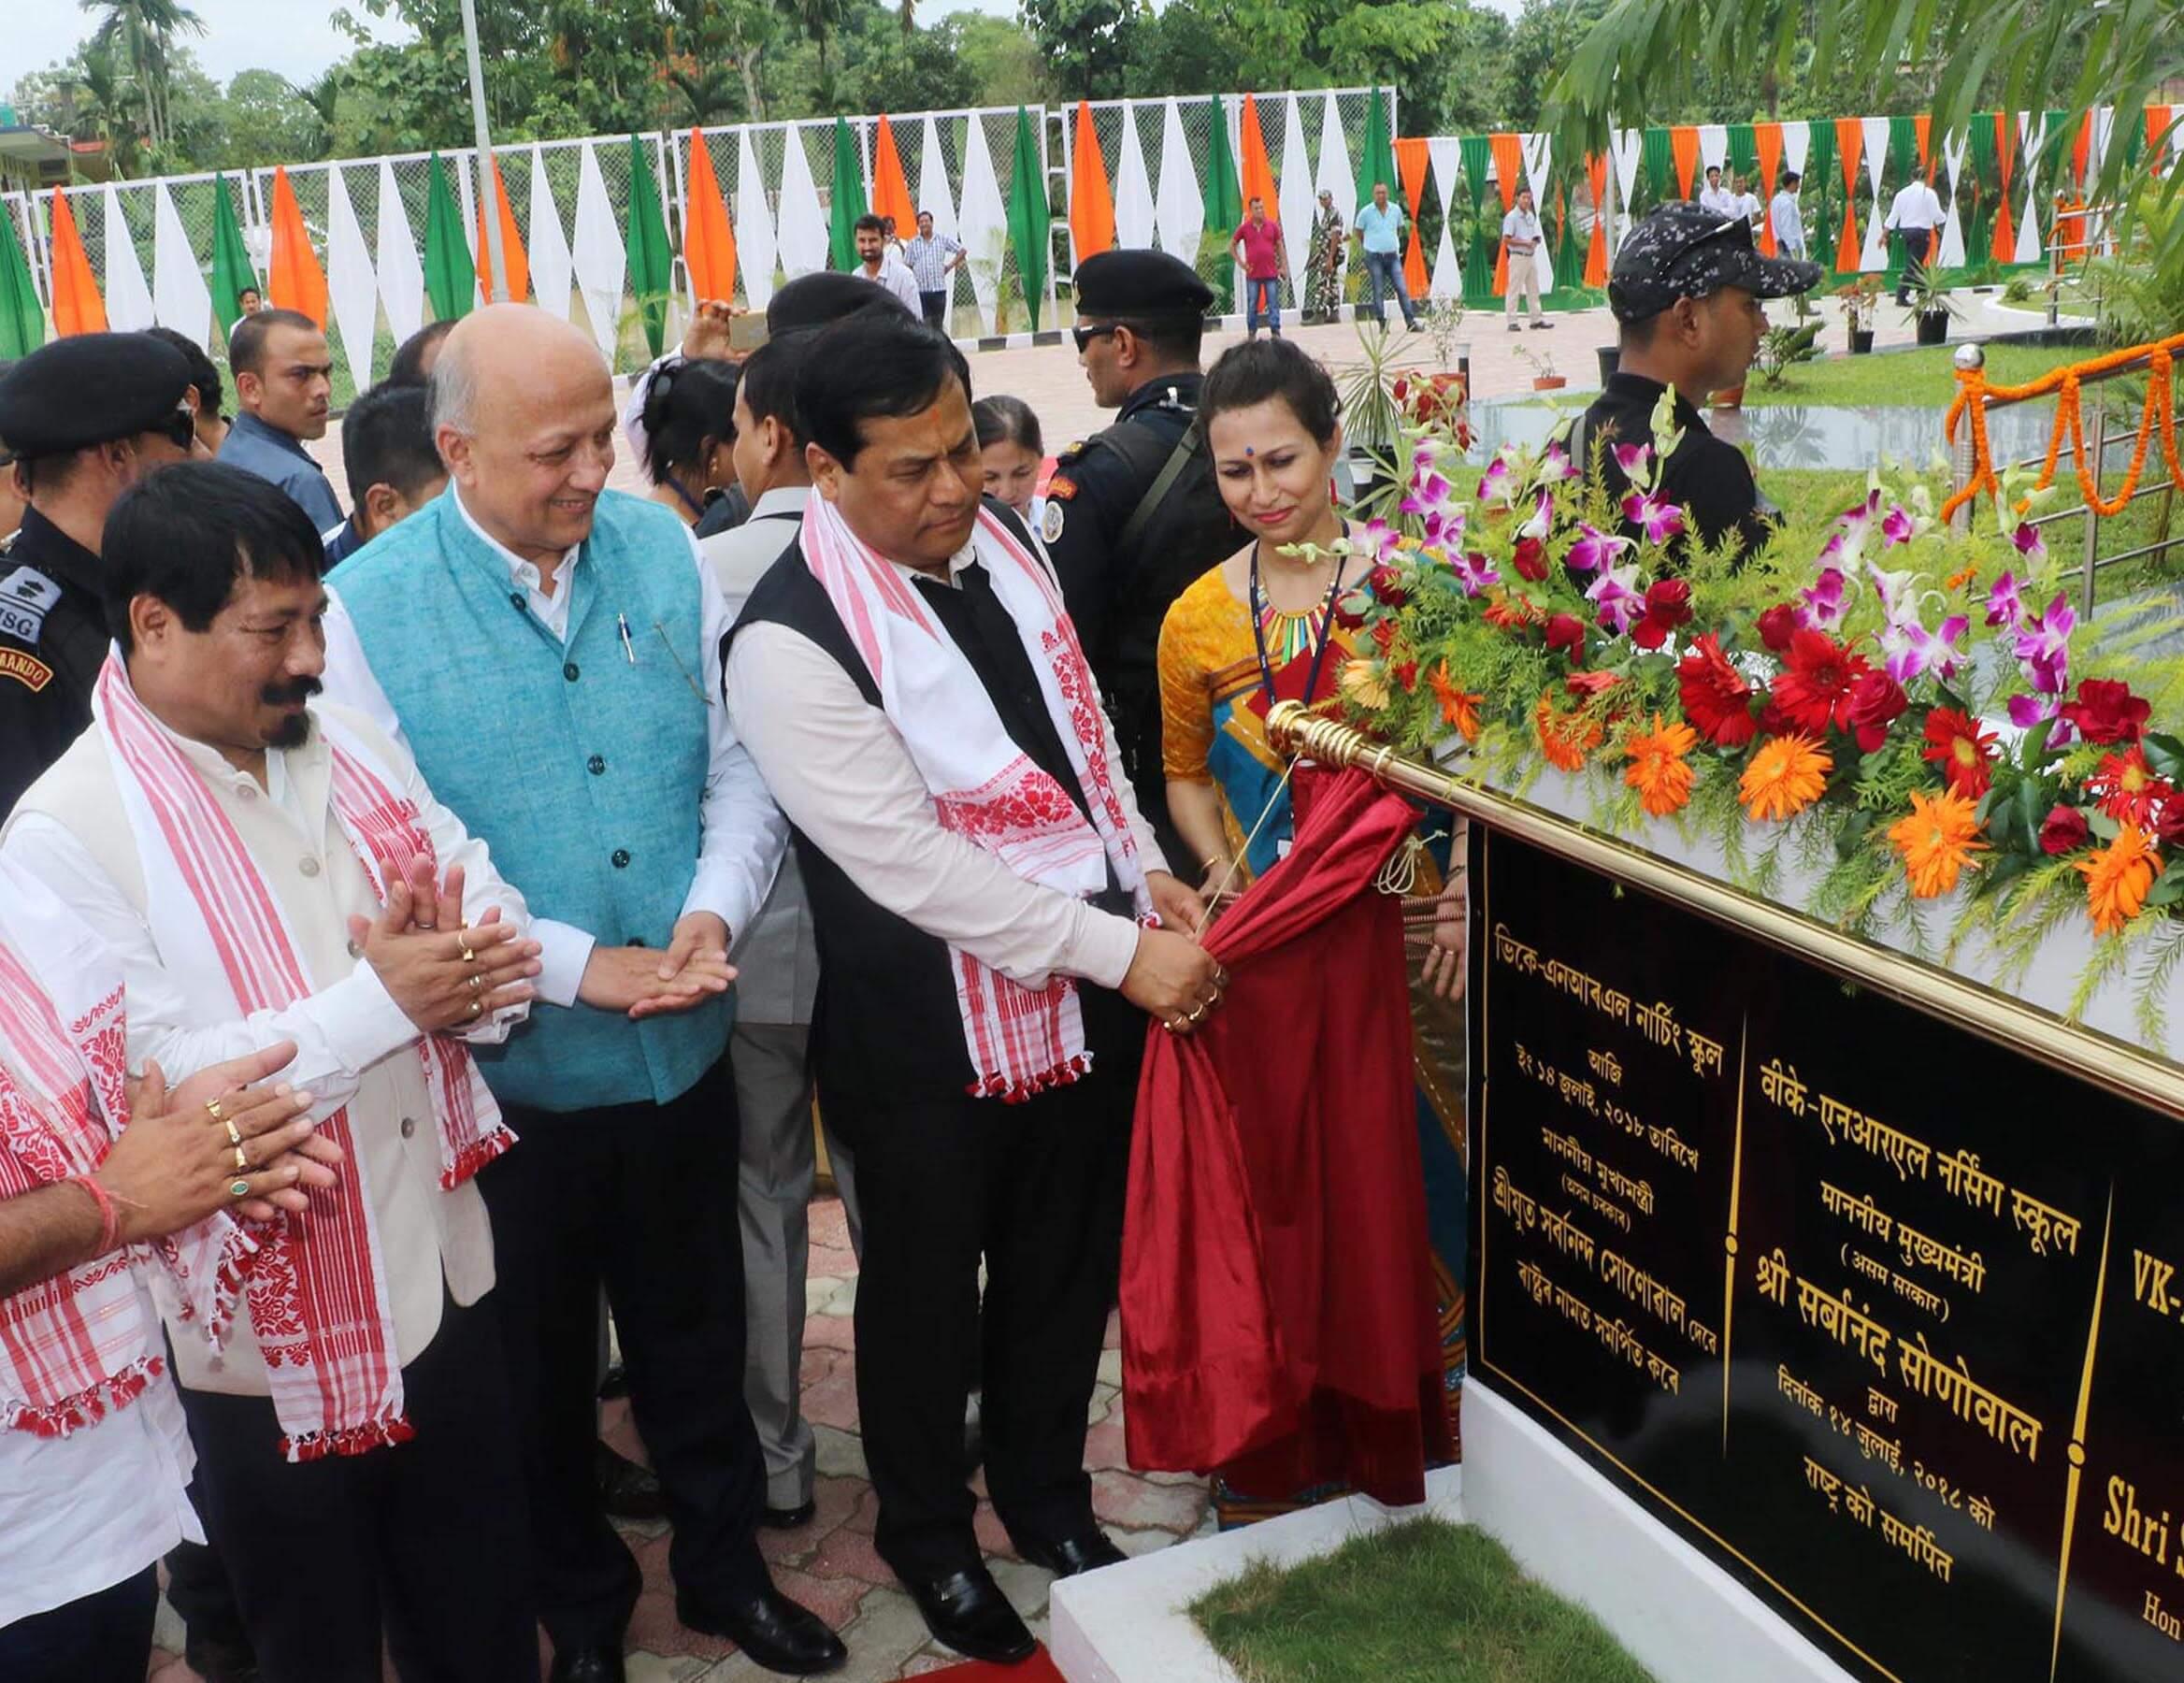 Assam Chief Minister Sarbananda Sonowal inaugurates VKNRL School of Nursing